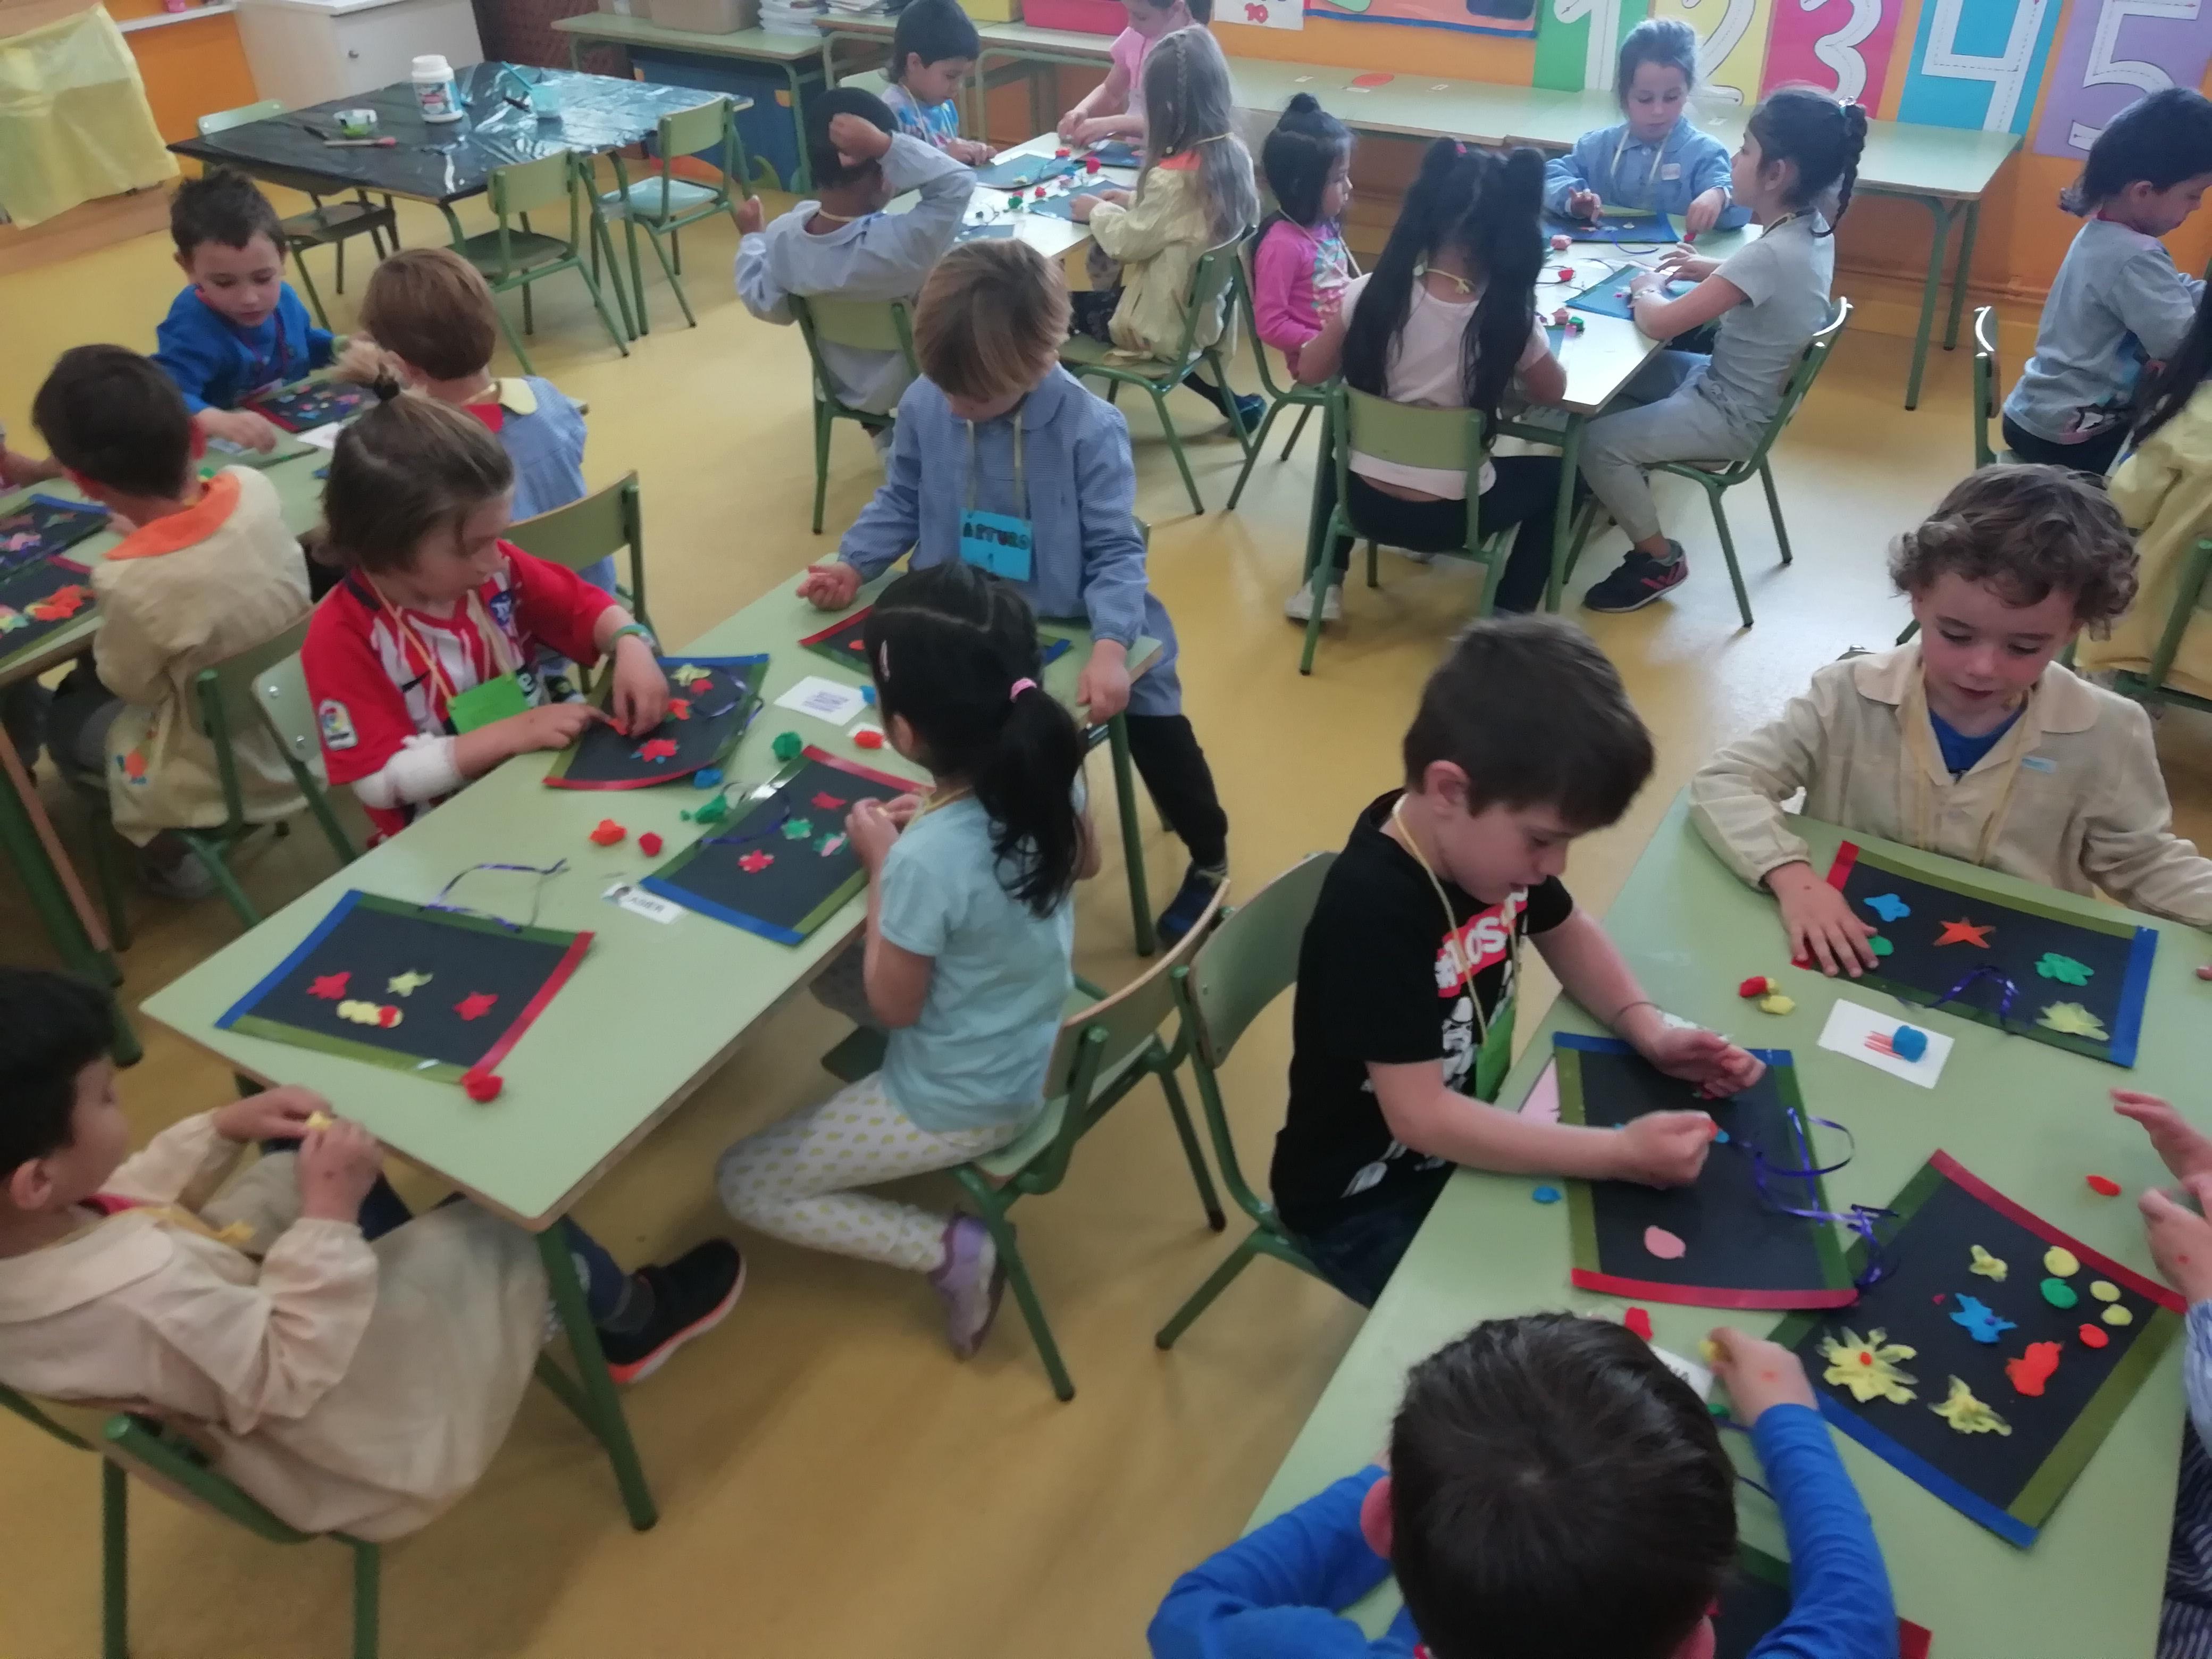 Jornadas Culturales 18-19. Taller de Plástica. Infantil 2